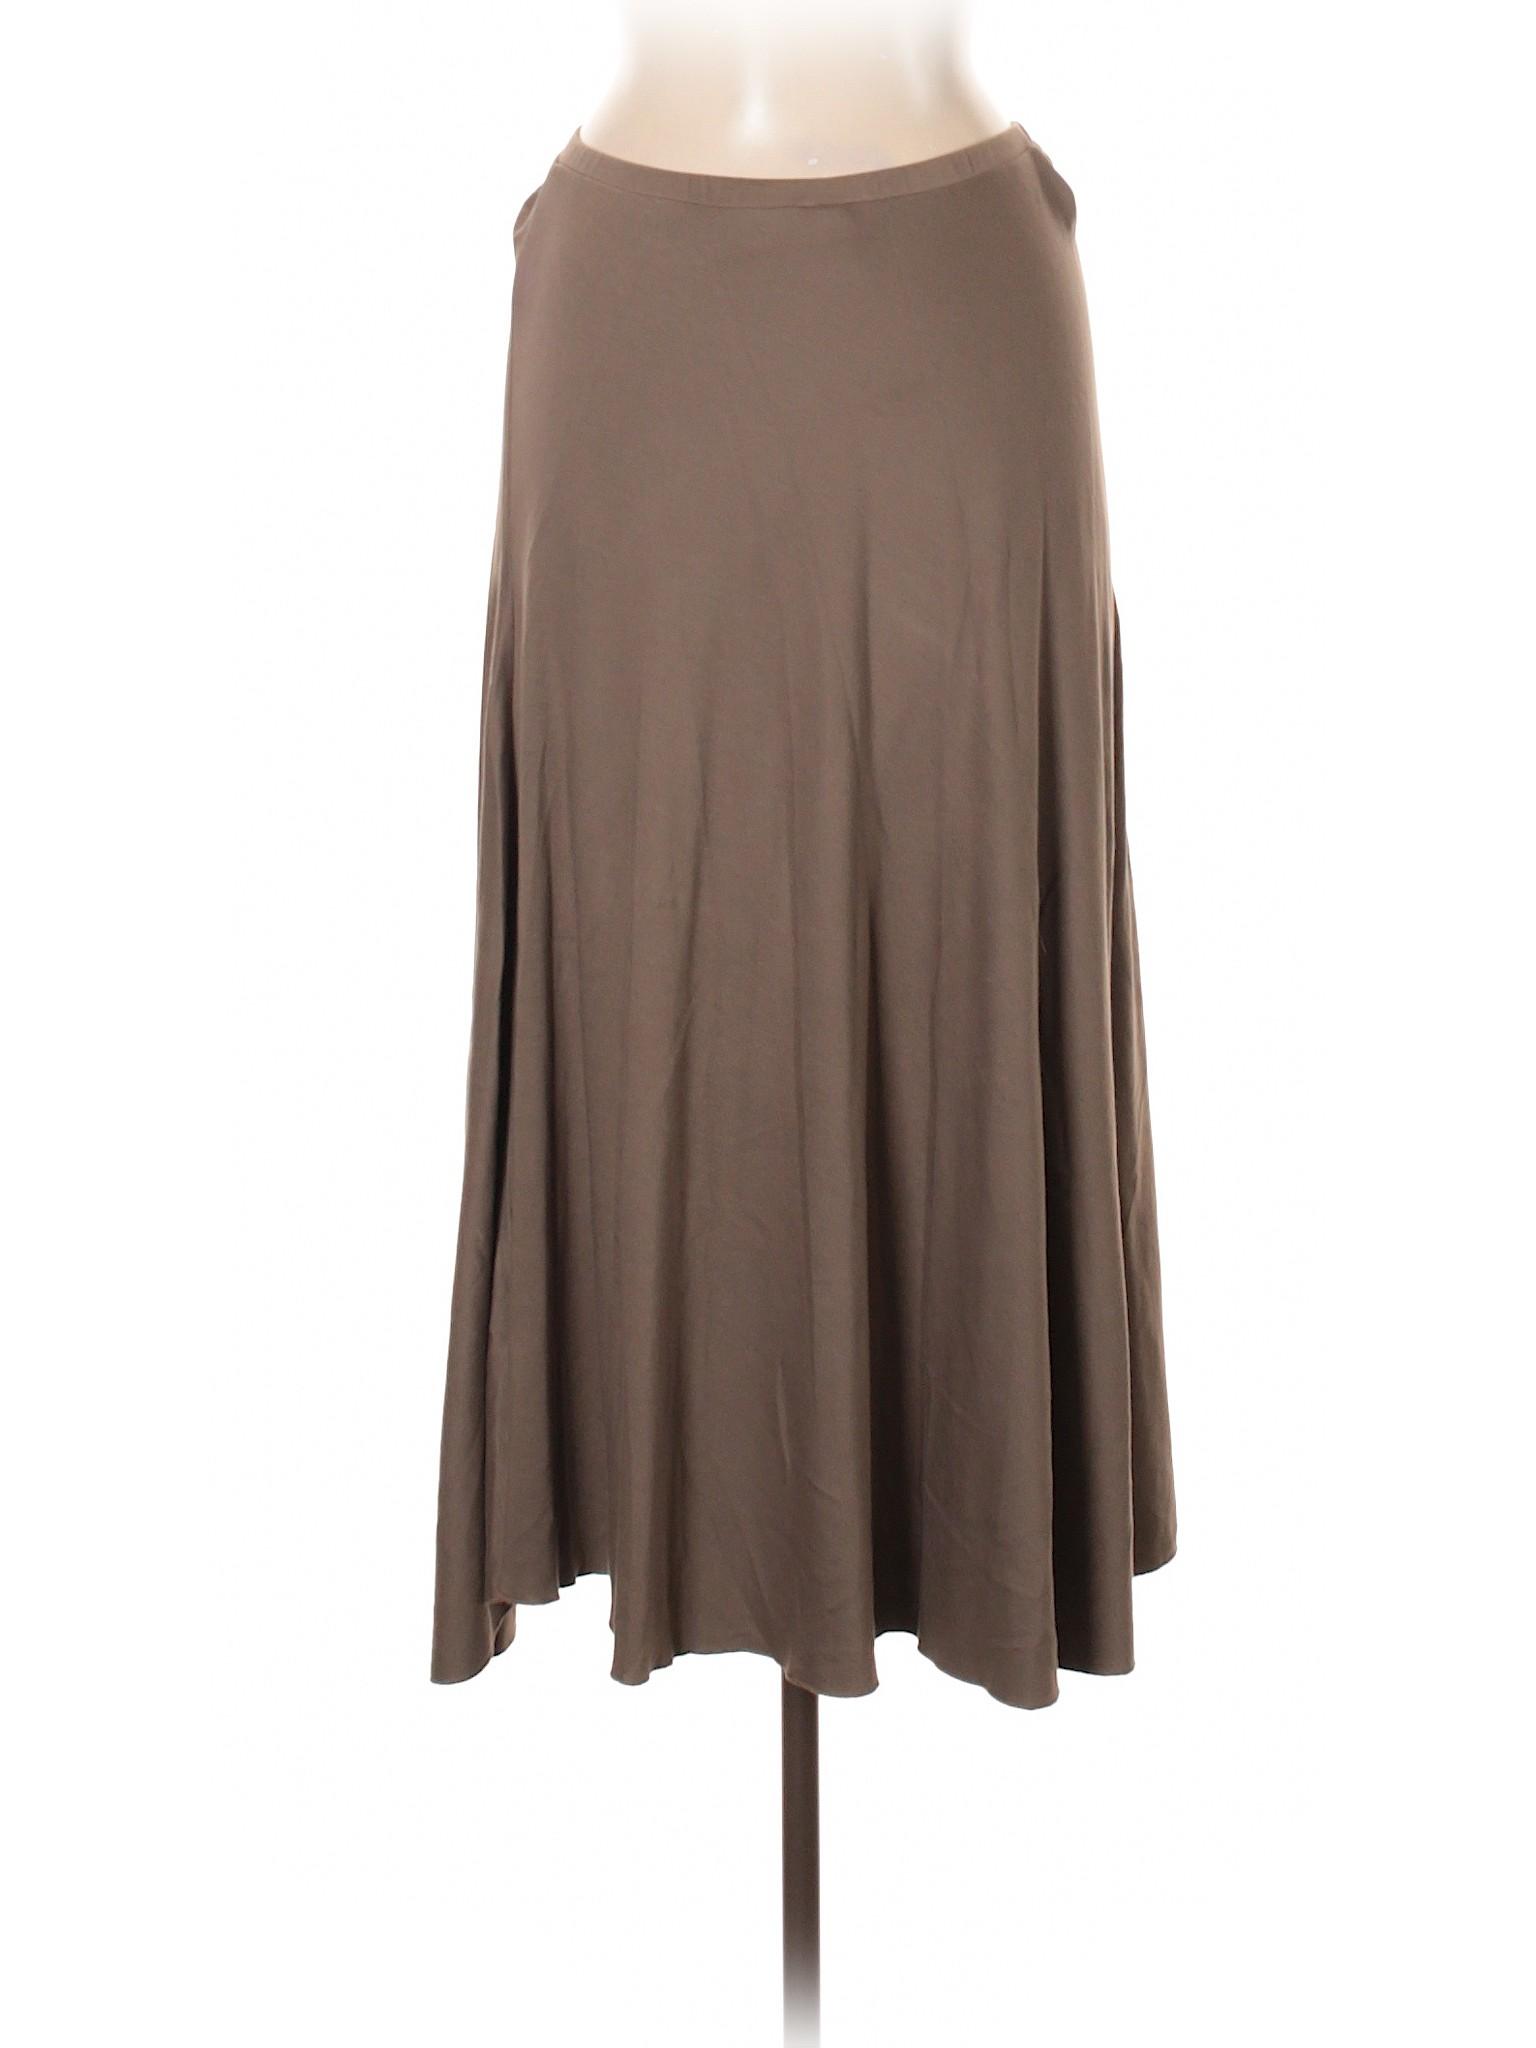 Skirt Casual Skirt Casual Casual Boutique Boutique Boutique Boutique Skirt qHgRwxCR